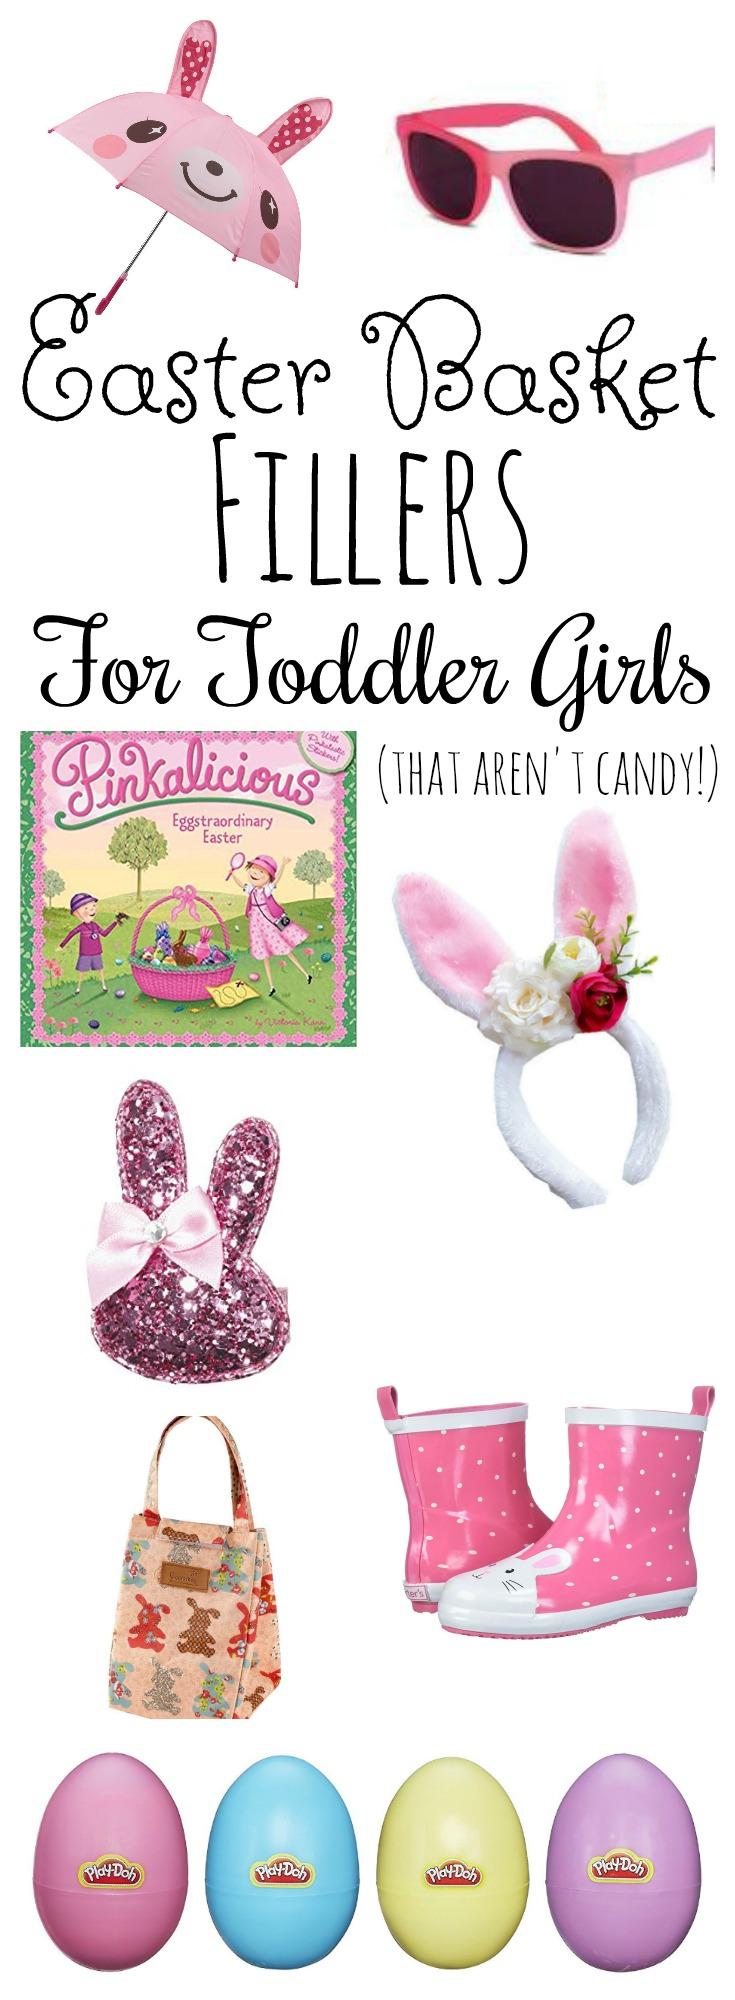 Non-Candy Easter Basket Filler Ideas for Toddler Girls